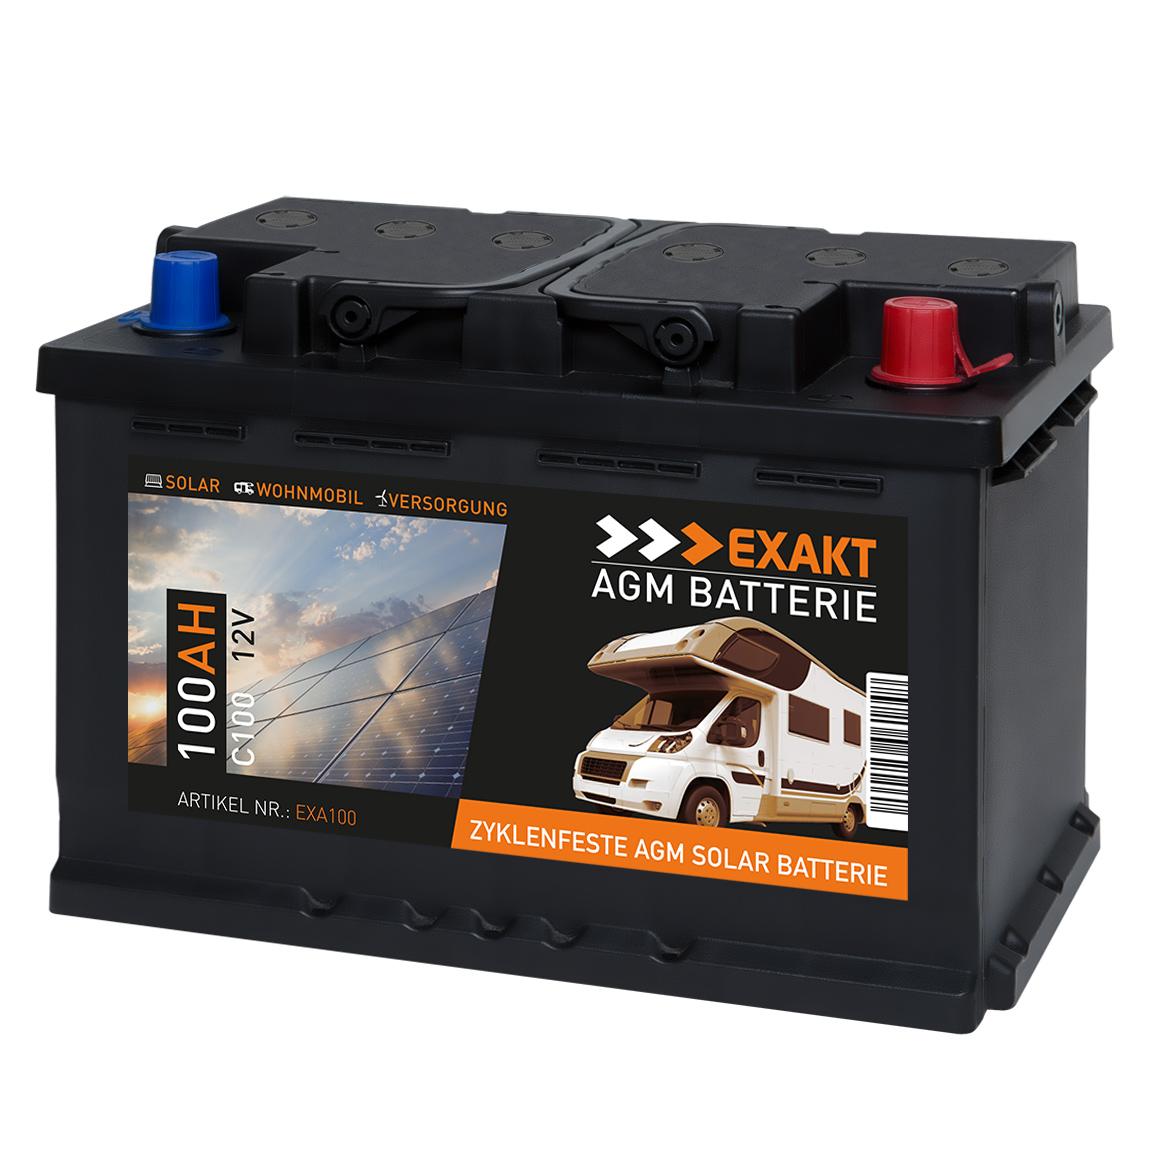 agm solarbatterie 100ah 12v wohnmobil versorgung boot. Black Bedroom Furniture Sets. Home Design Ideas